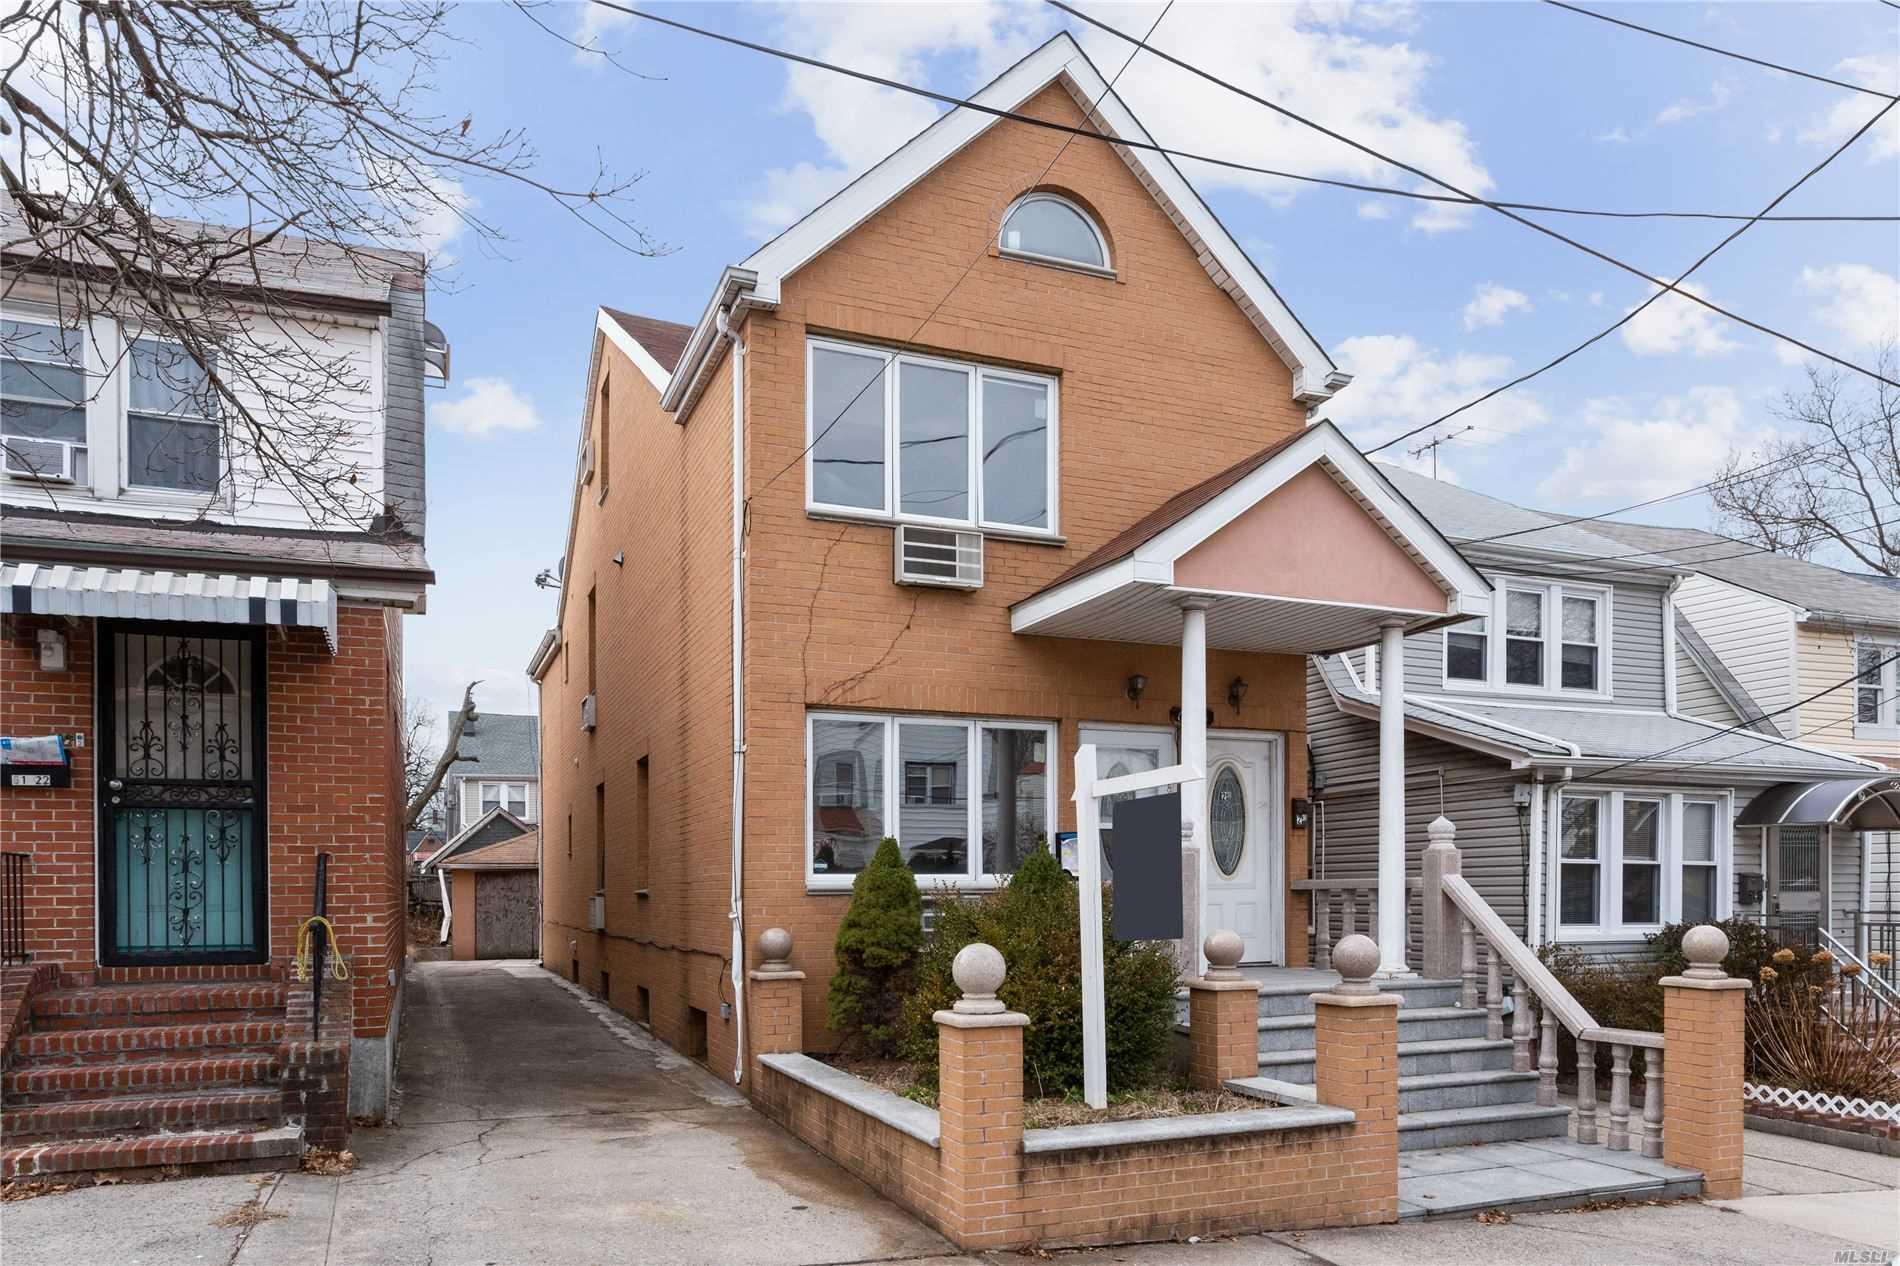 Property for sale at 61-18 Parsons Boulevard, Flushing NY 11365, Flushing,  New York 11365